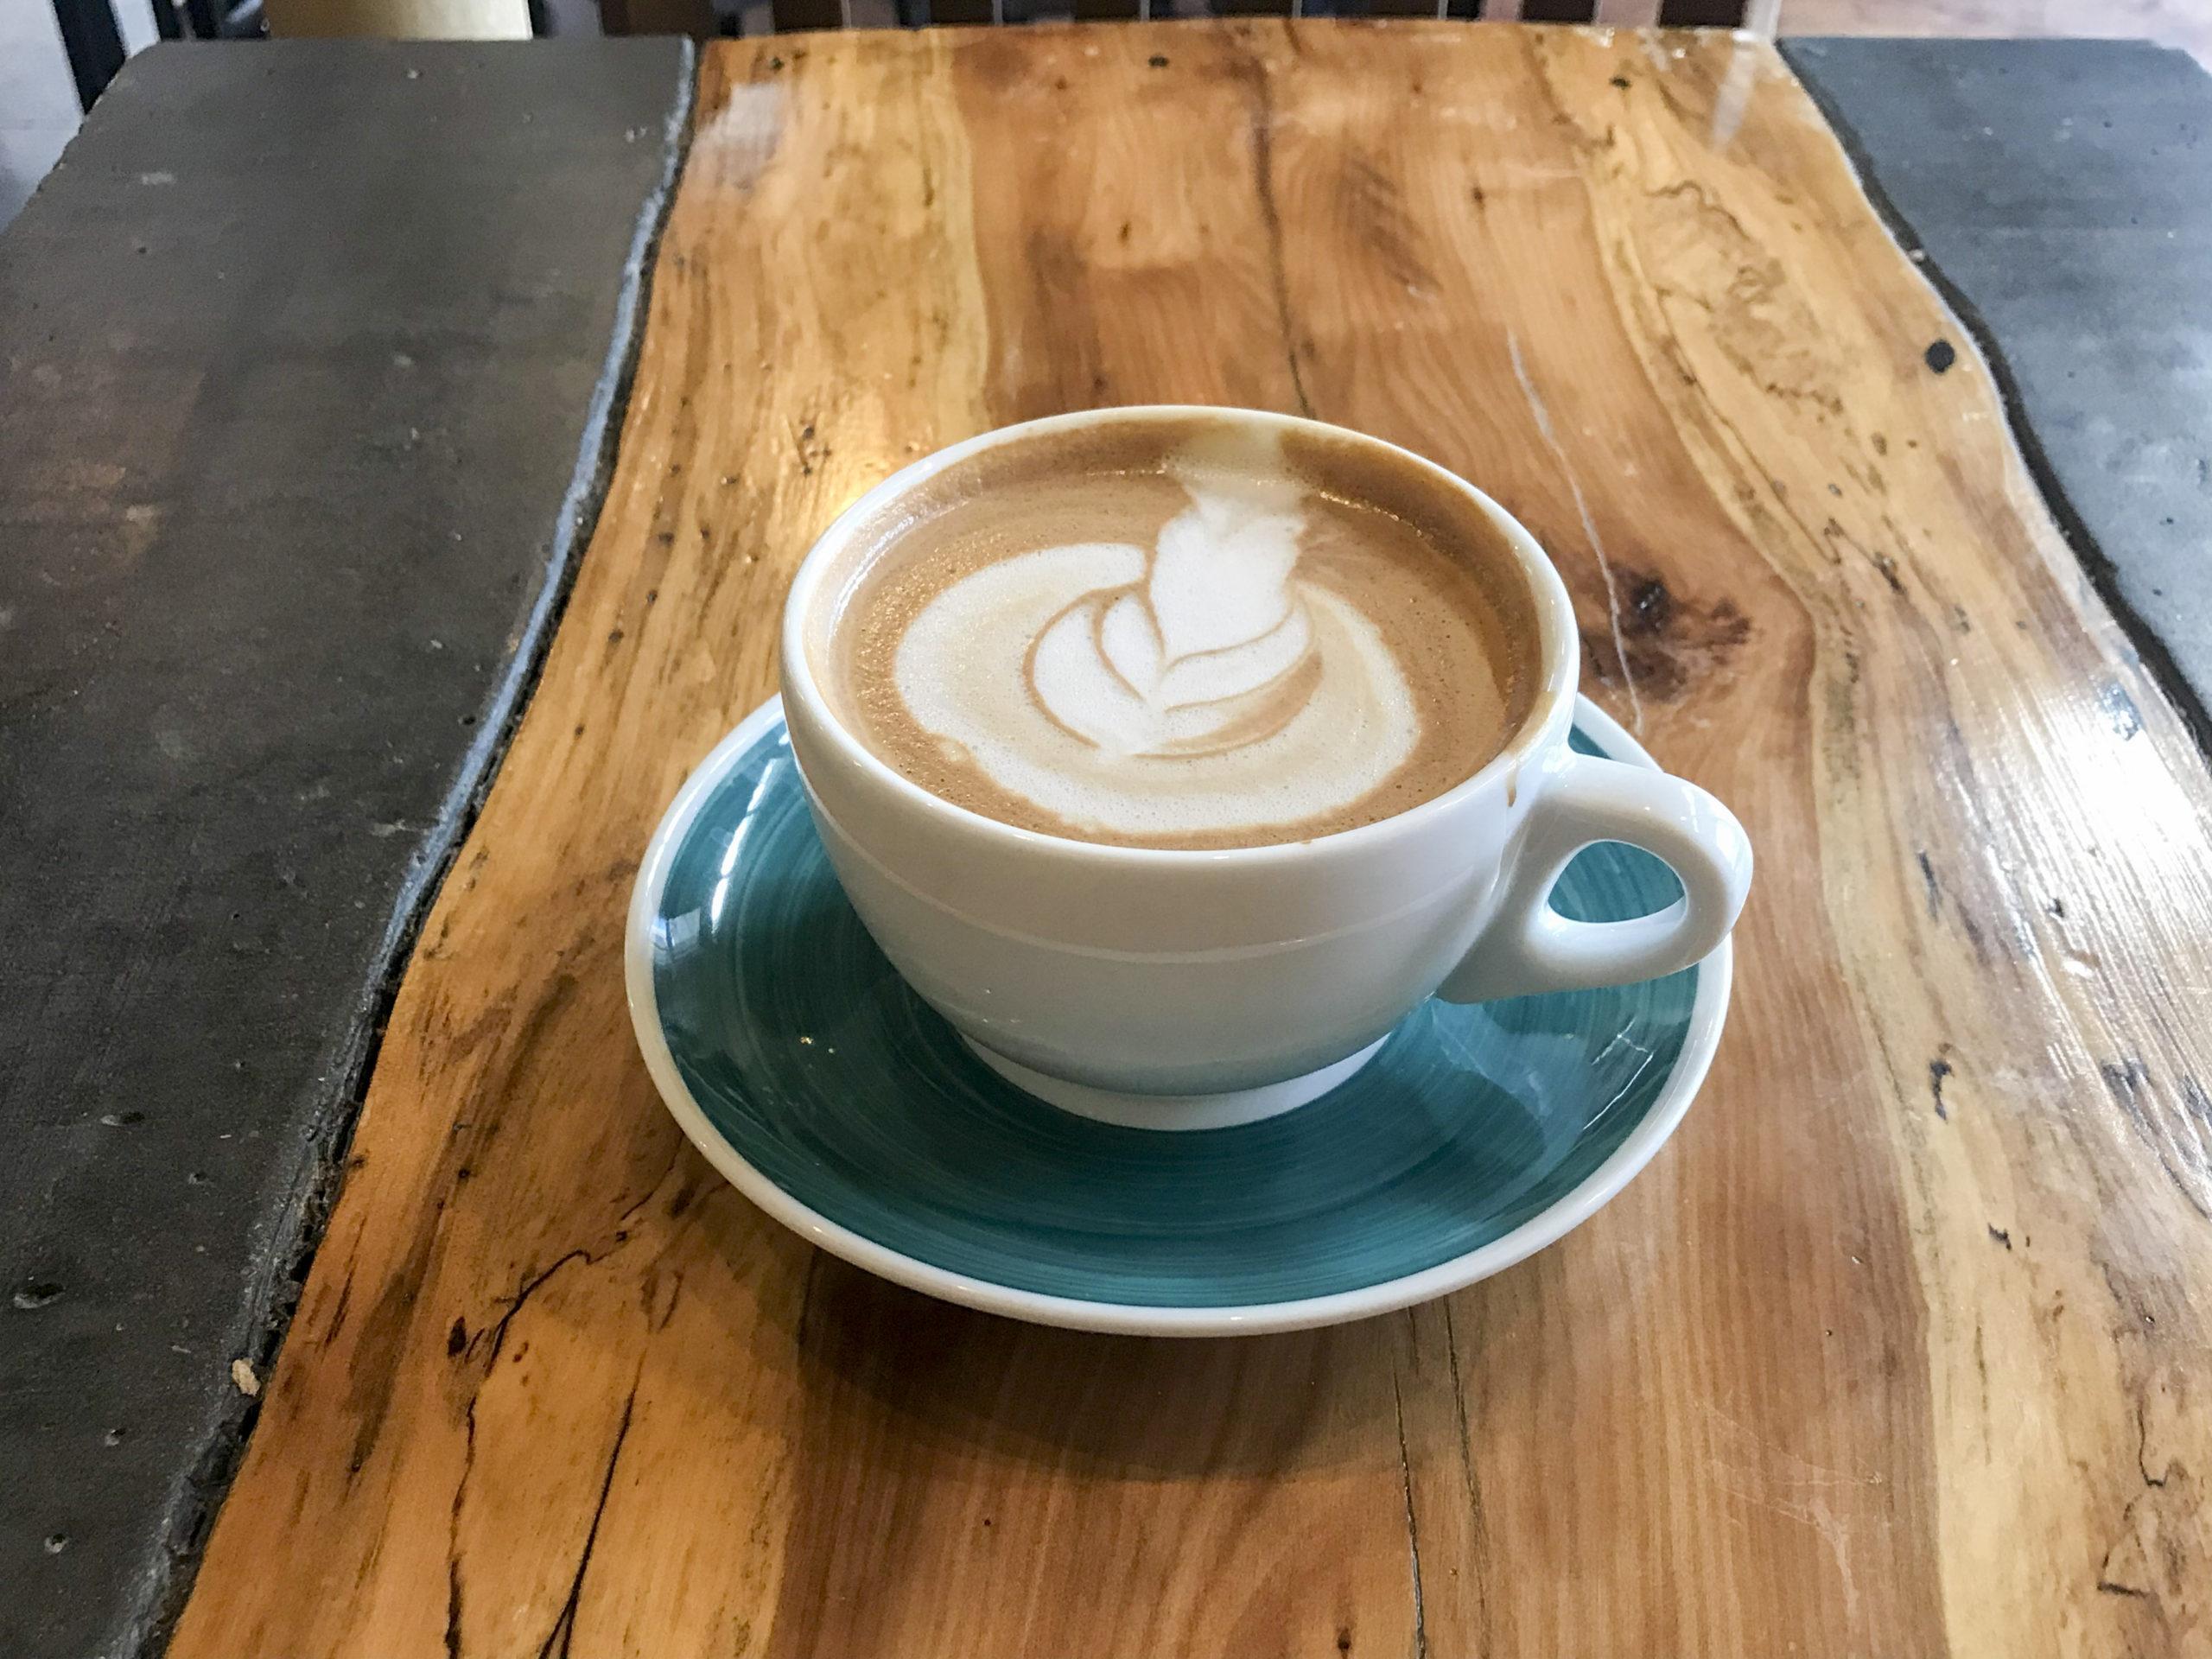 Banyan Cafe Hot Mocha Latte with Almond Milk